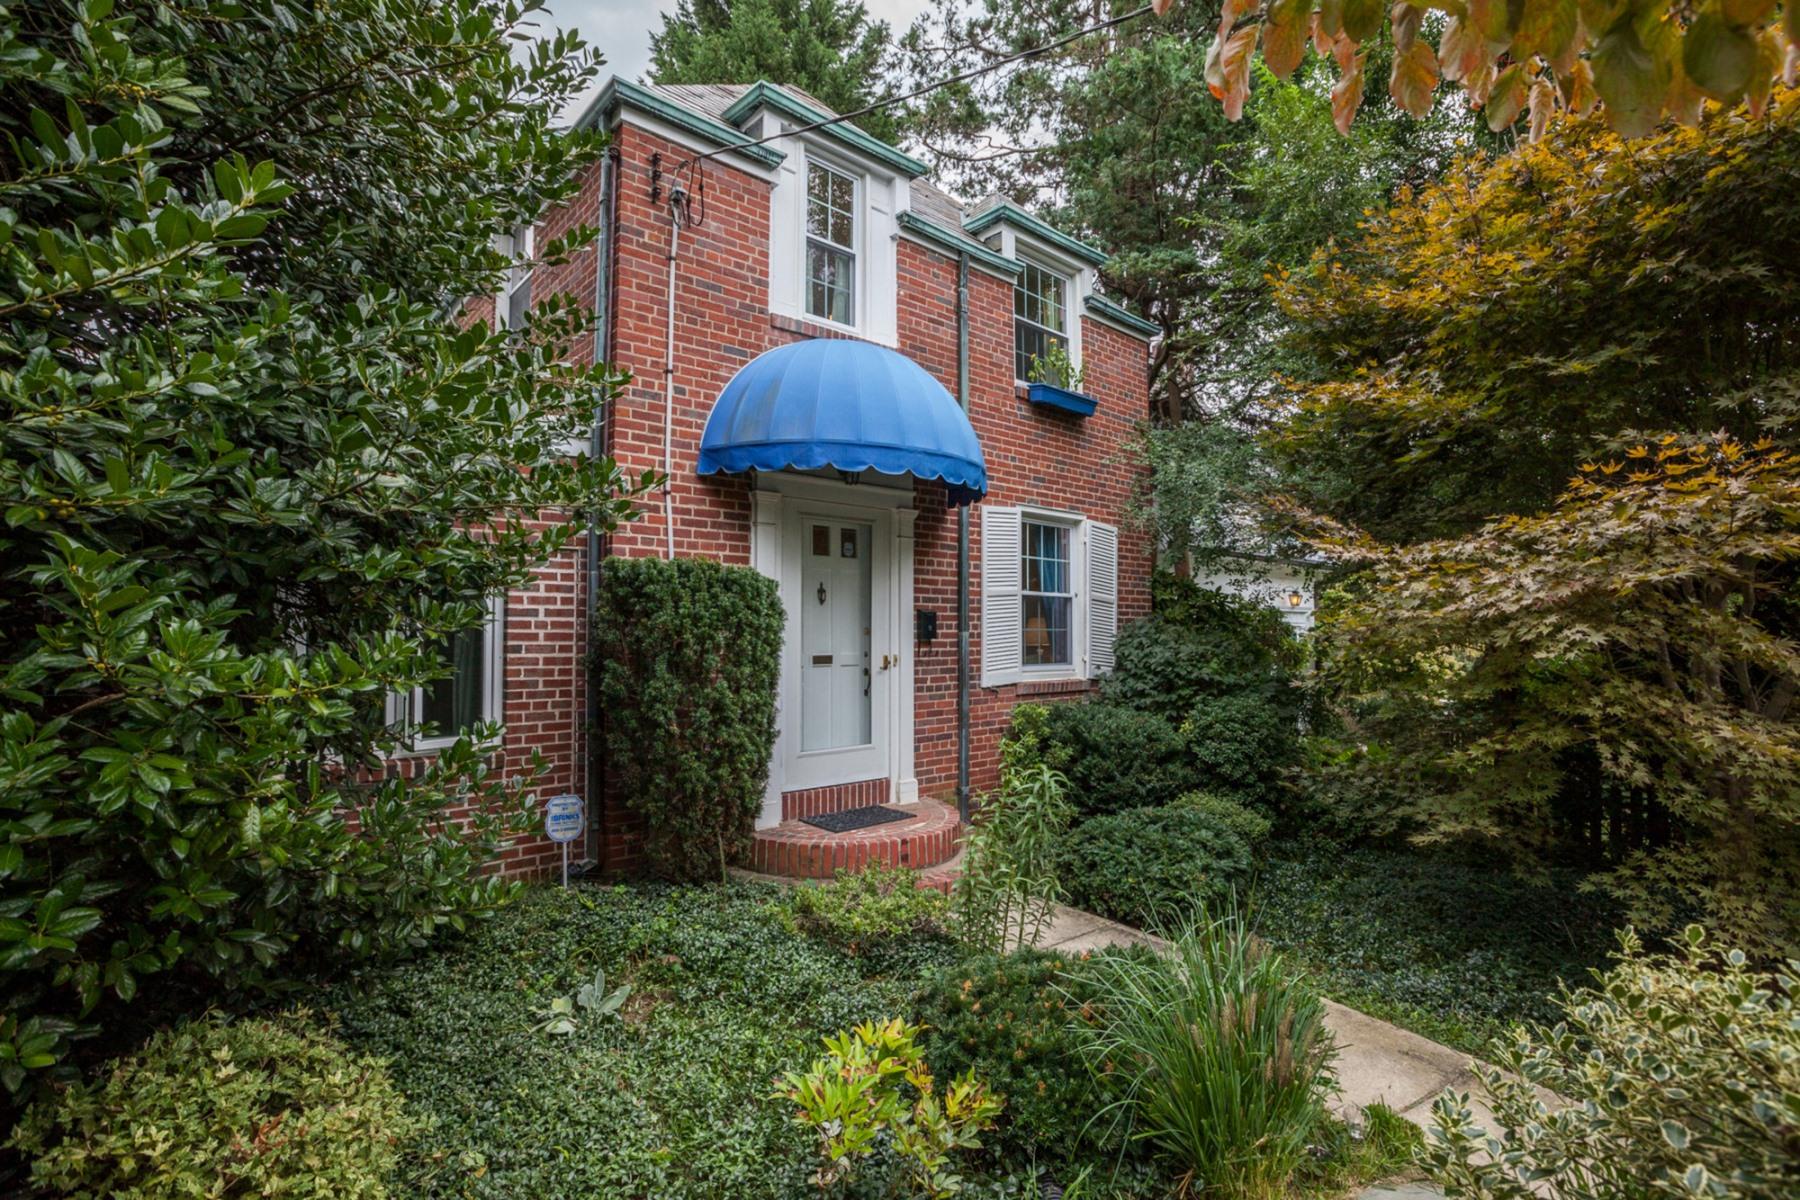 Single Family Home for Sale at 4613 Bayard Boulevard, Bethesda 4613 Bayard Blvd Bethesda, Maryland 20816 United States